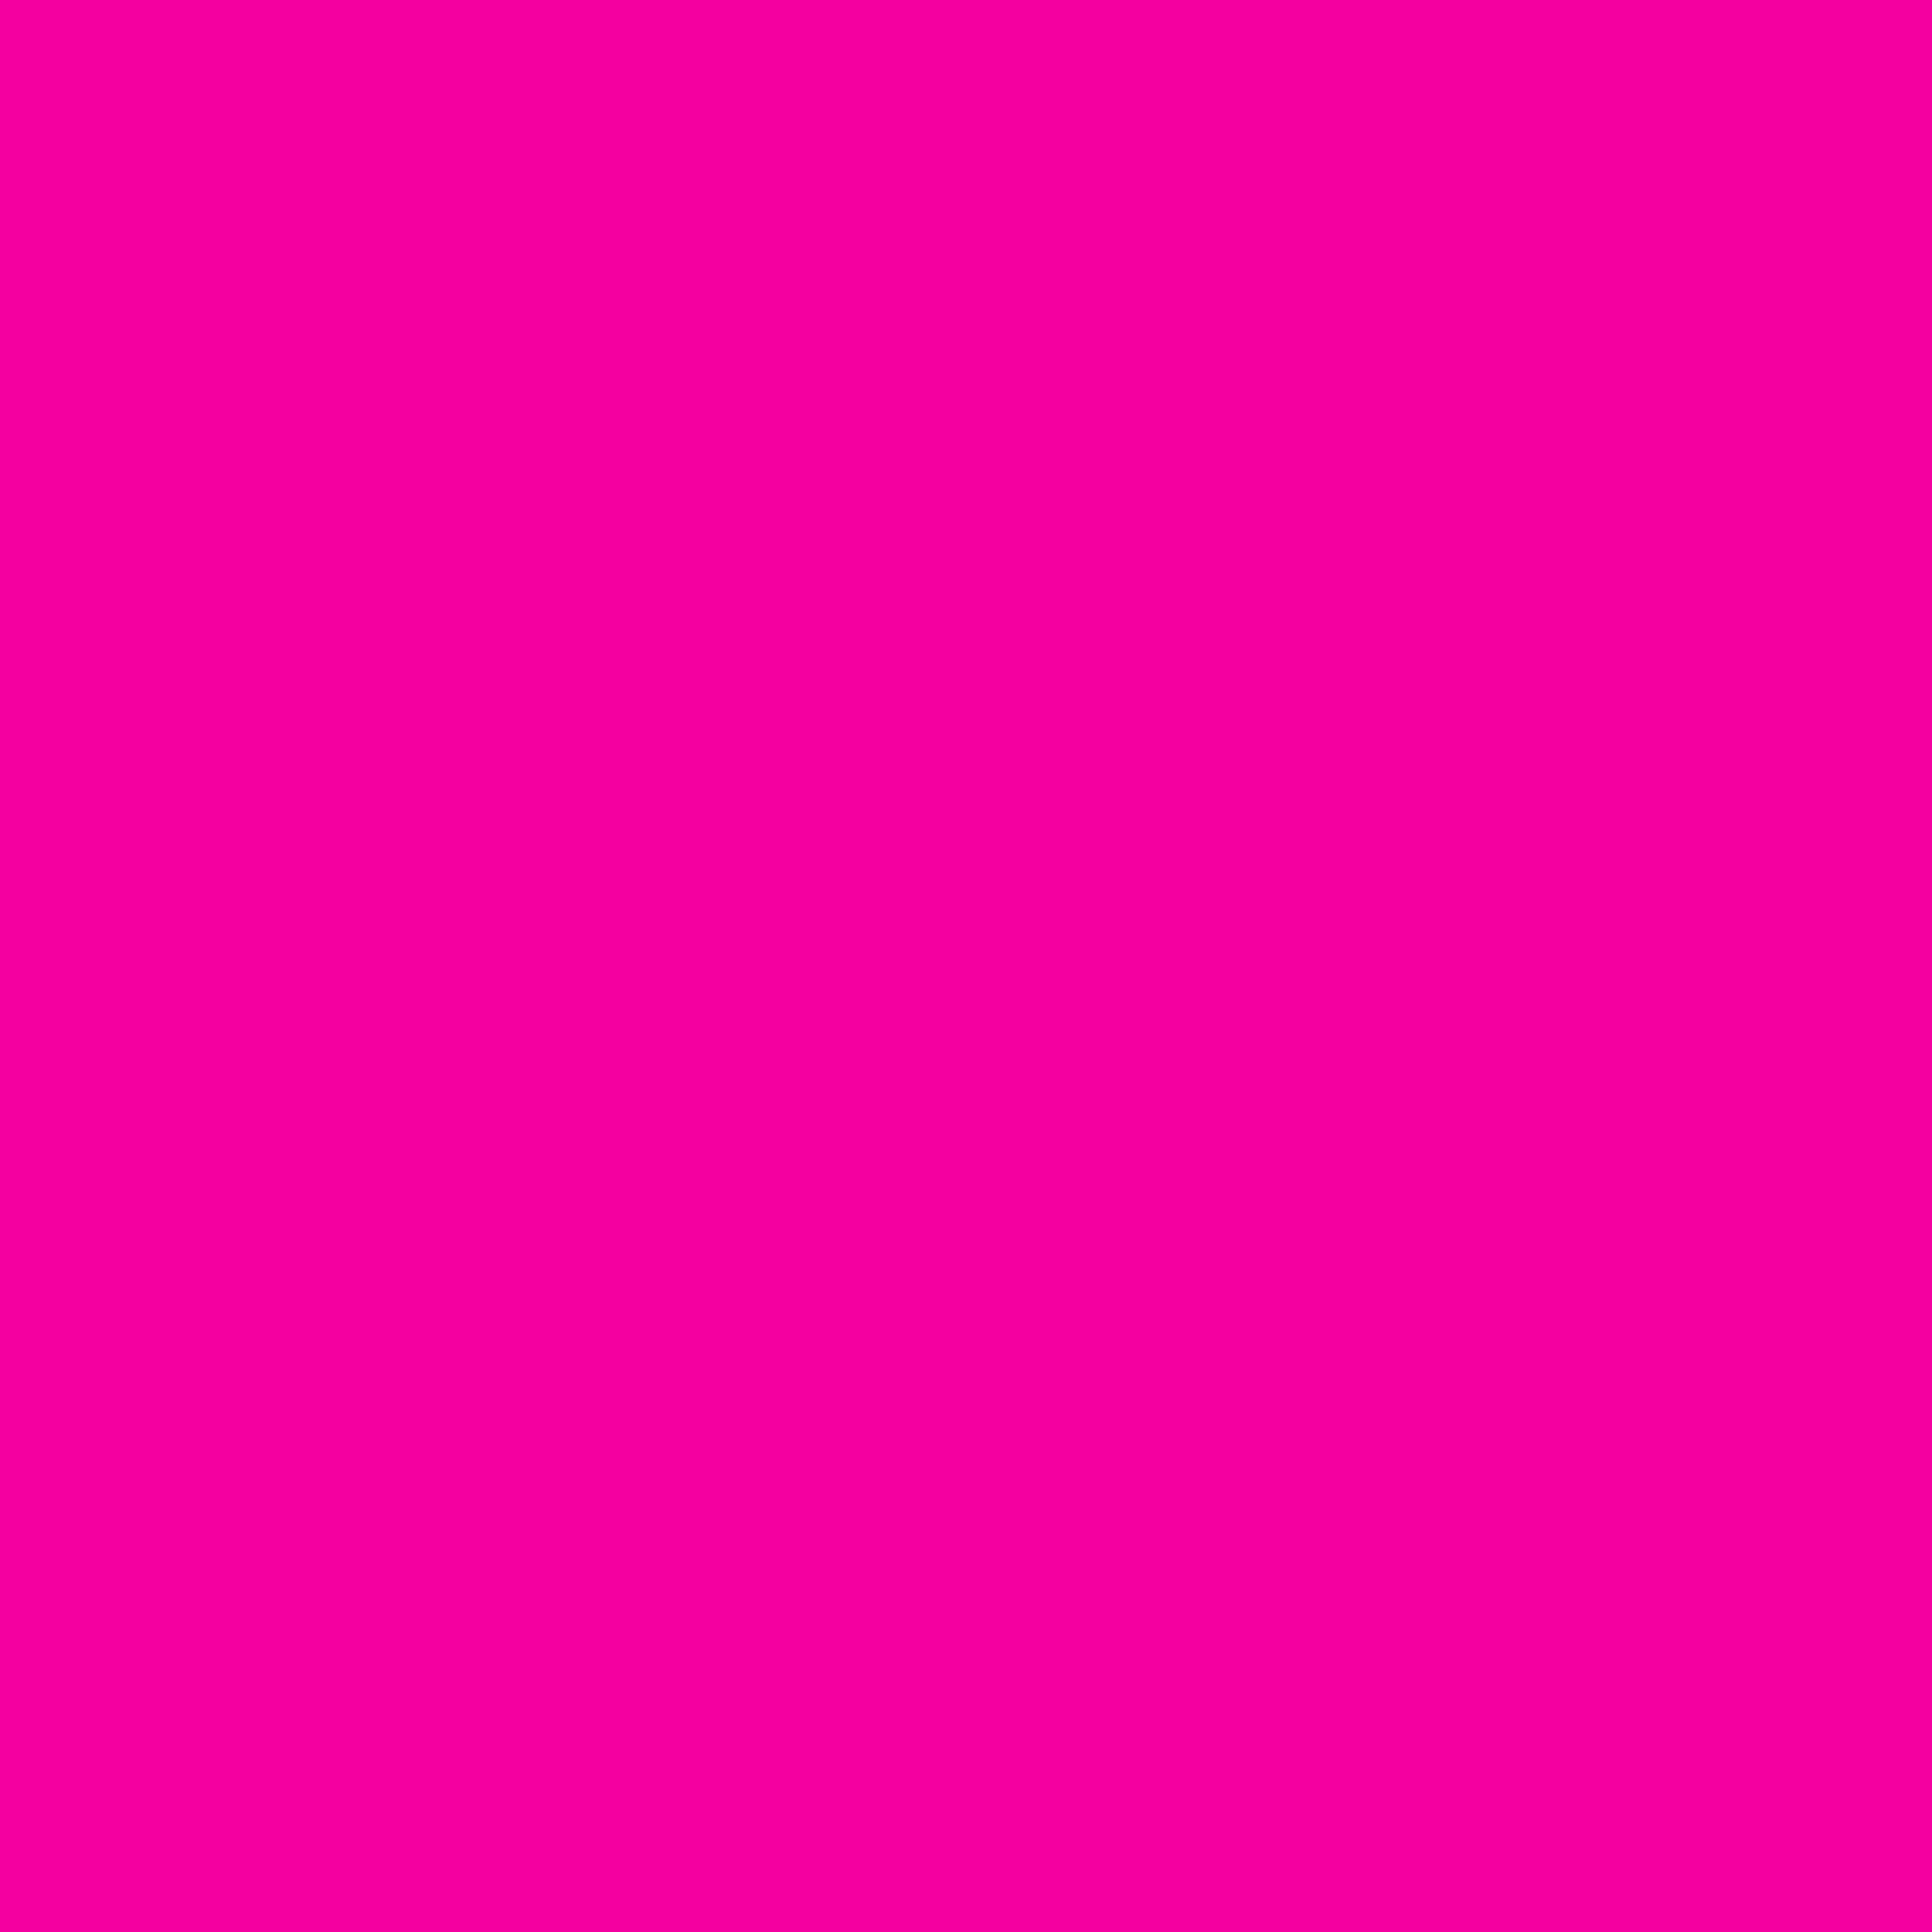 2048x2048 Fashion Fuchsia Solid Color Background